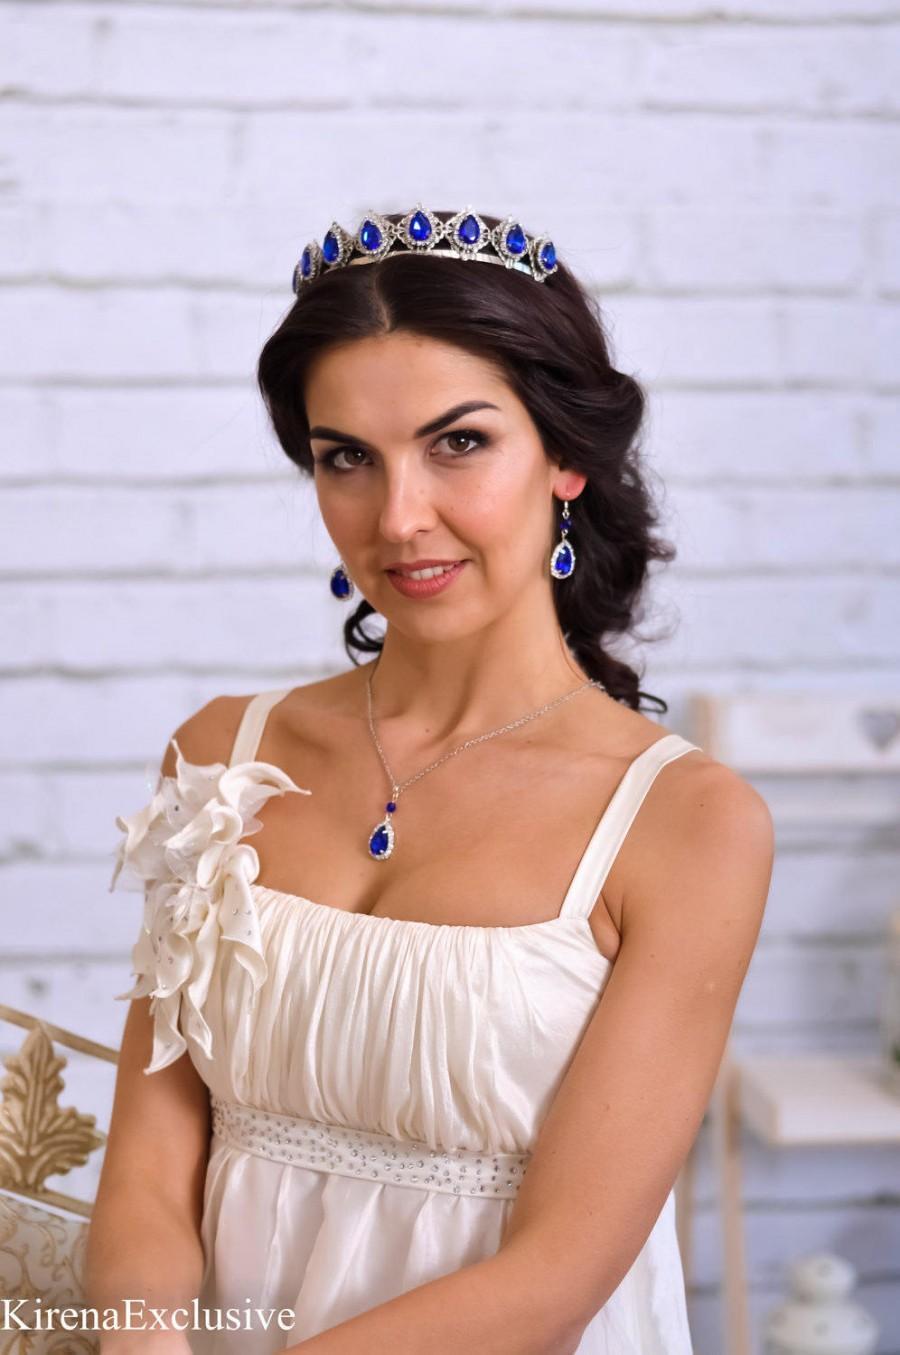 bridal tiara wedding headpiece bridal crown wedding hair